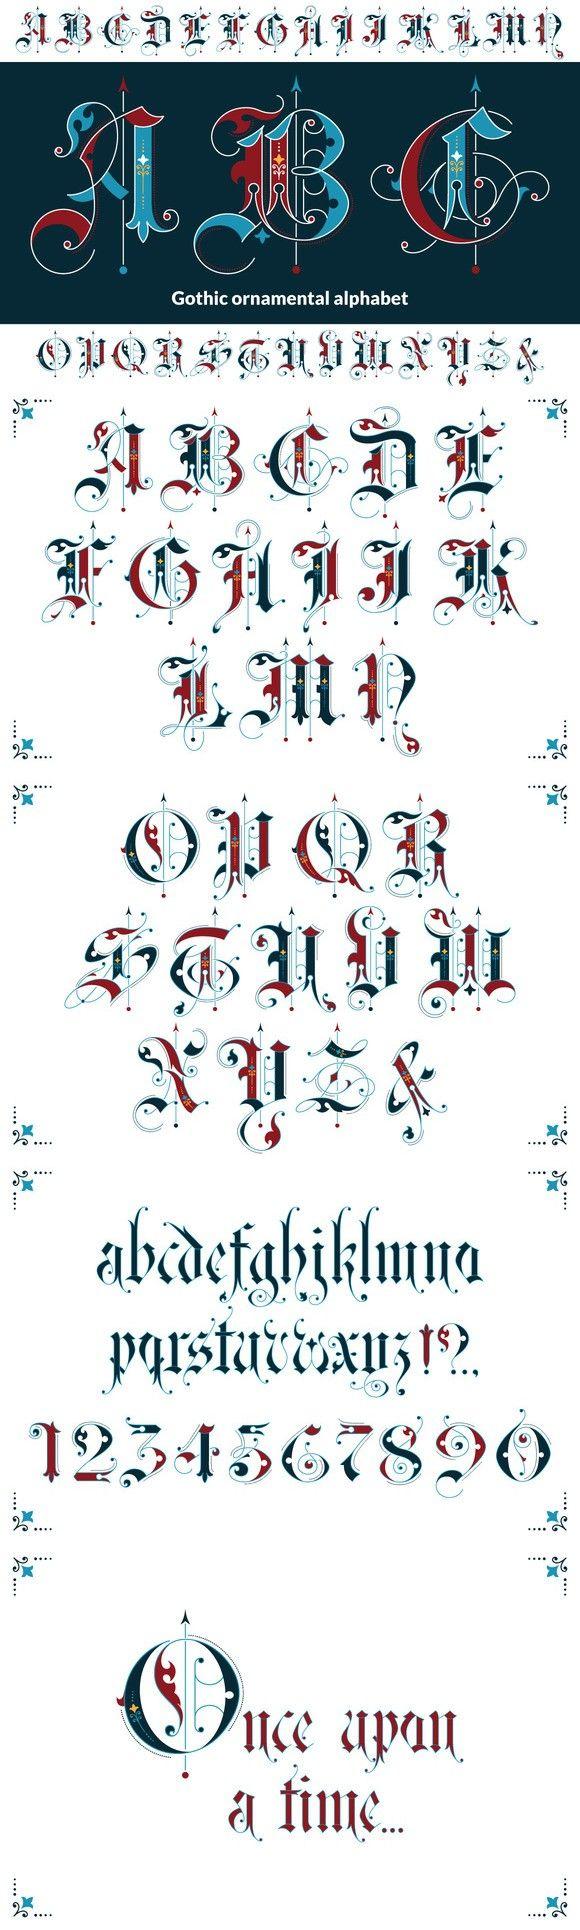 Gothic ornamental alphabet